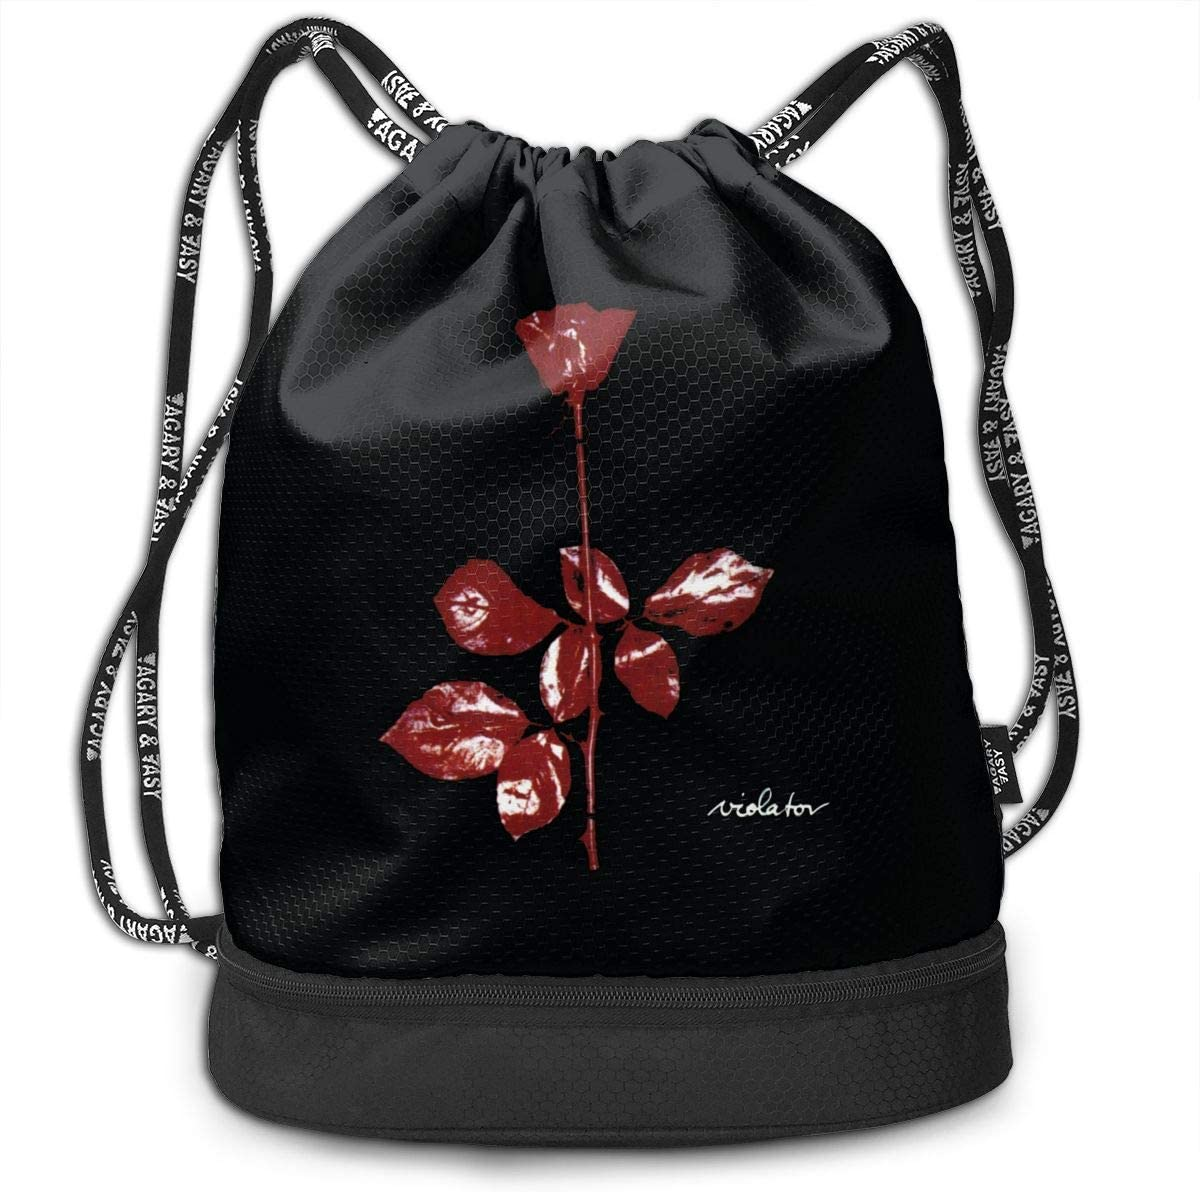 DIDhsswuz Depeche Mode Violator Unisex Drawstring Backpack Drawstring Bag Bundle Backpack Yoga Bag